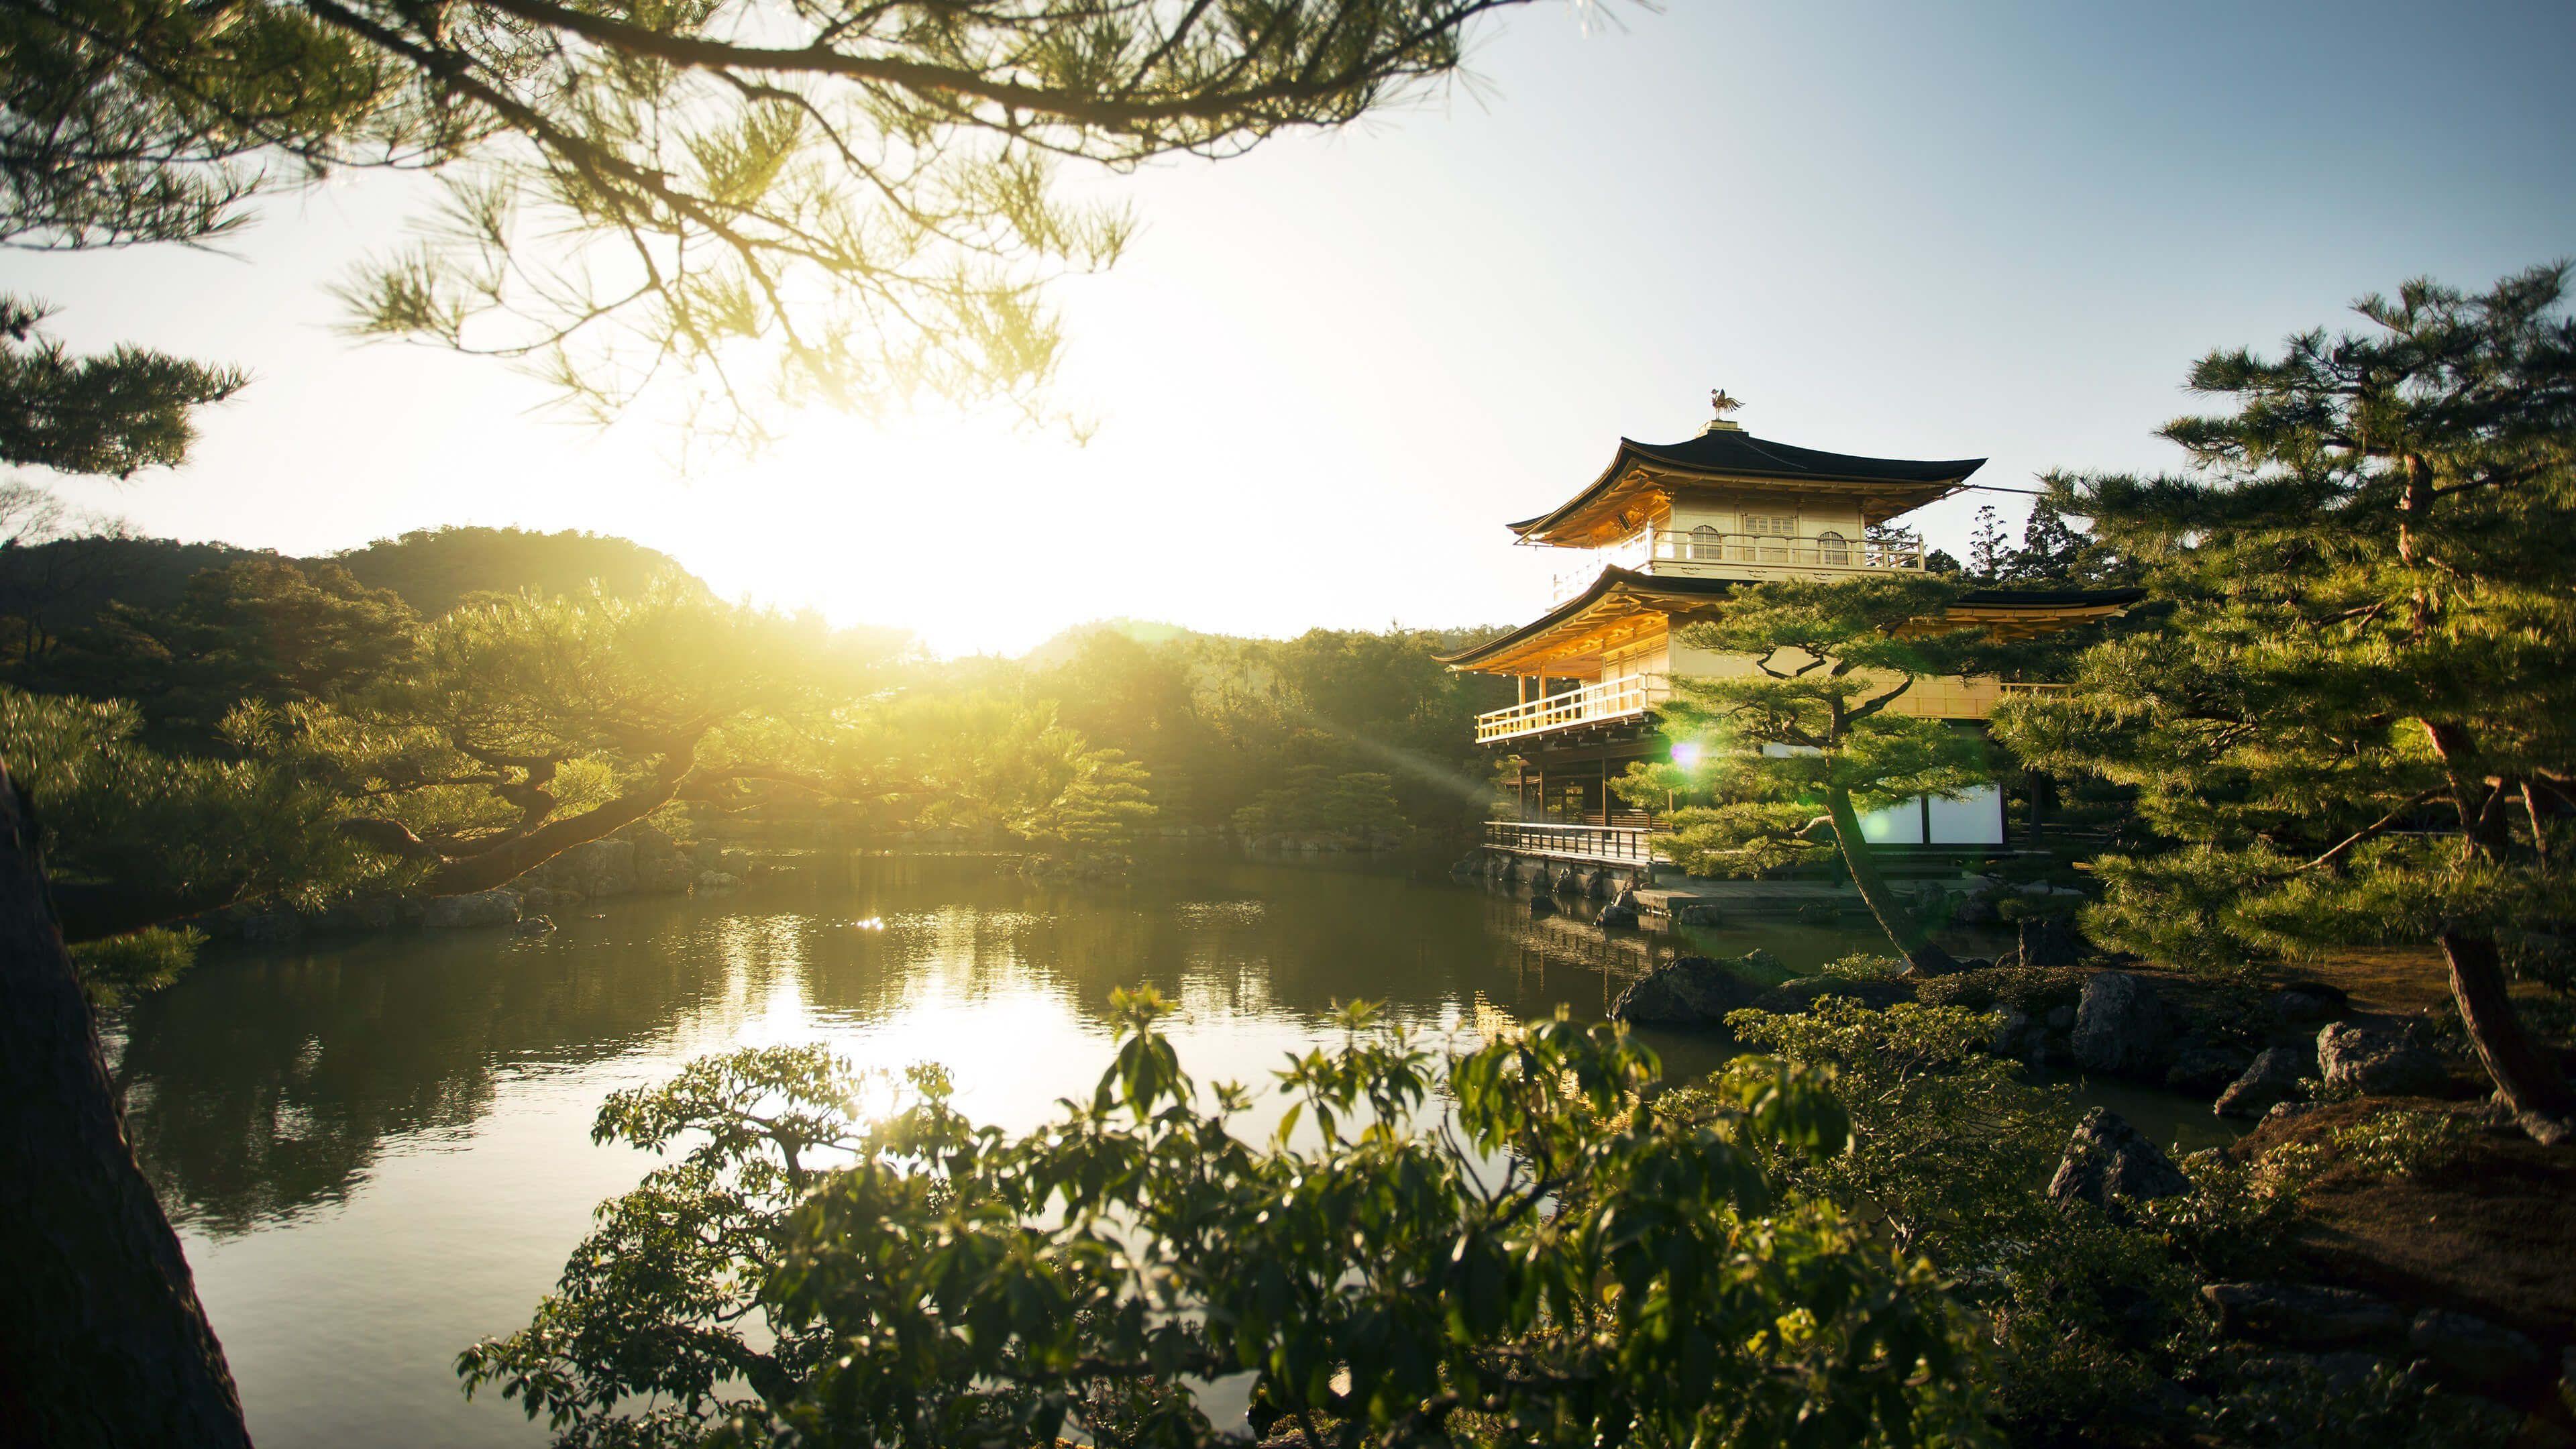 Temple Of The Golden Pavilion Kinkaku Ji Kyoto Japan 4k Uhd 3840 X 2160 See More On Classy Br World Wallpaper Asian Wallpaper Temple Of The Golden Pavilion